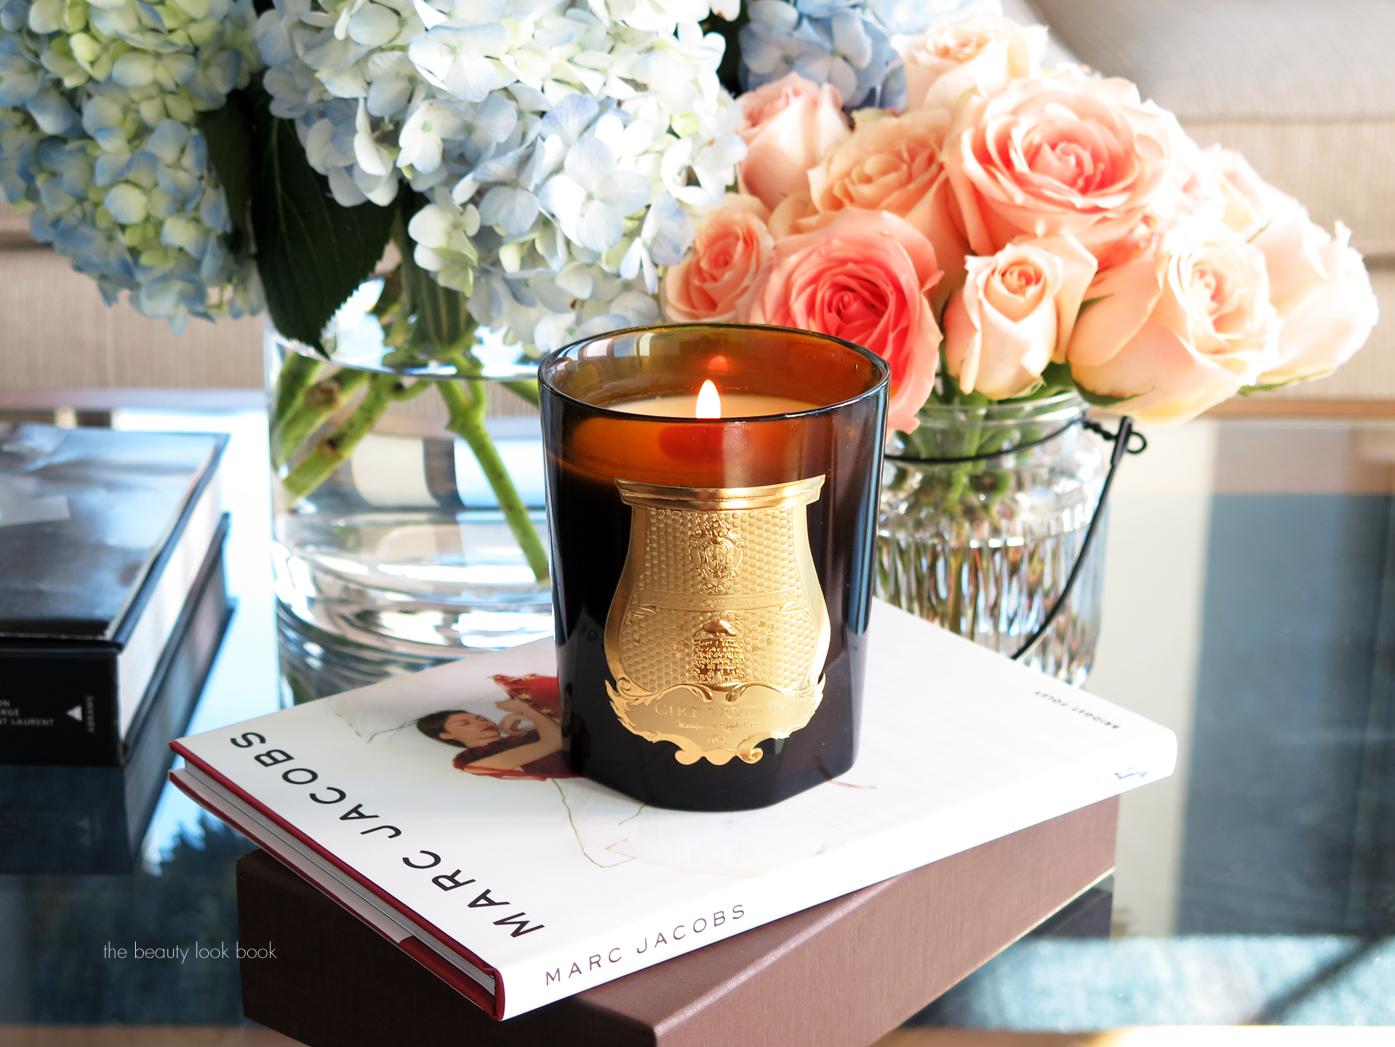 Cire Trudon Odalisque The Beauty Look Book